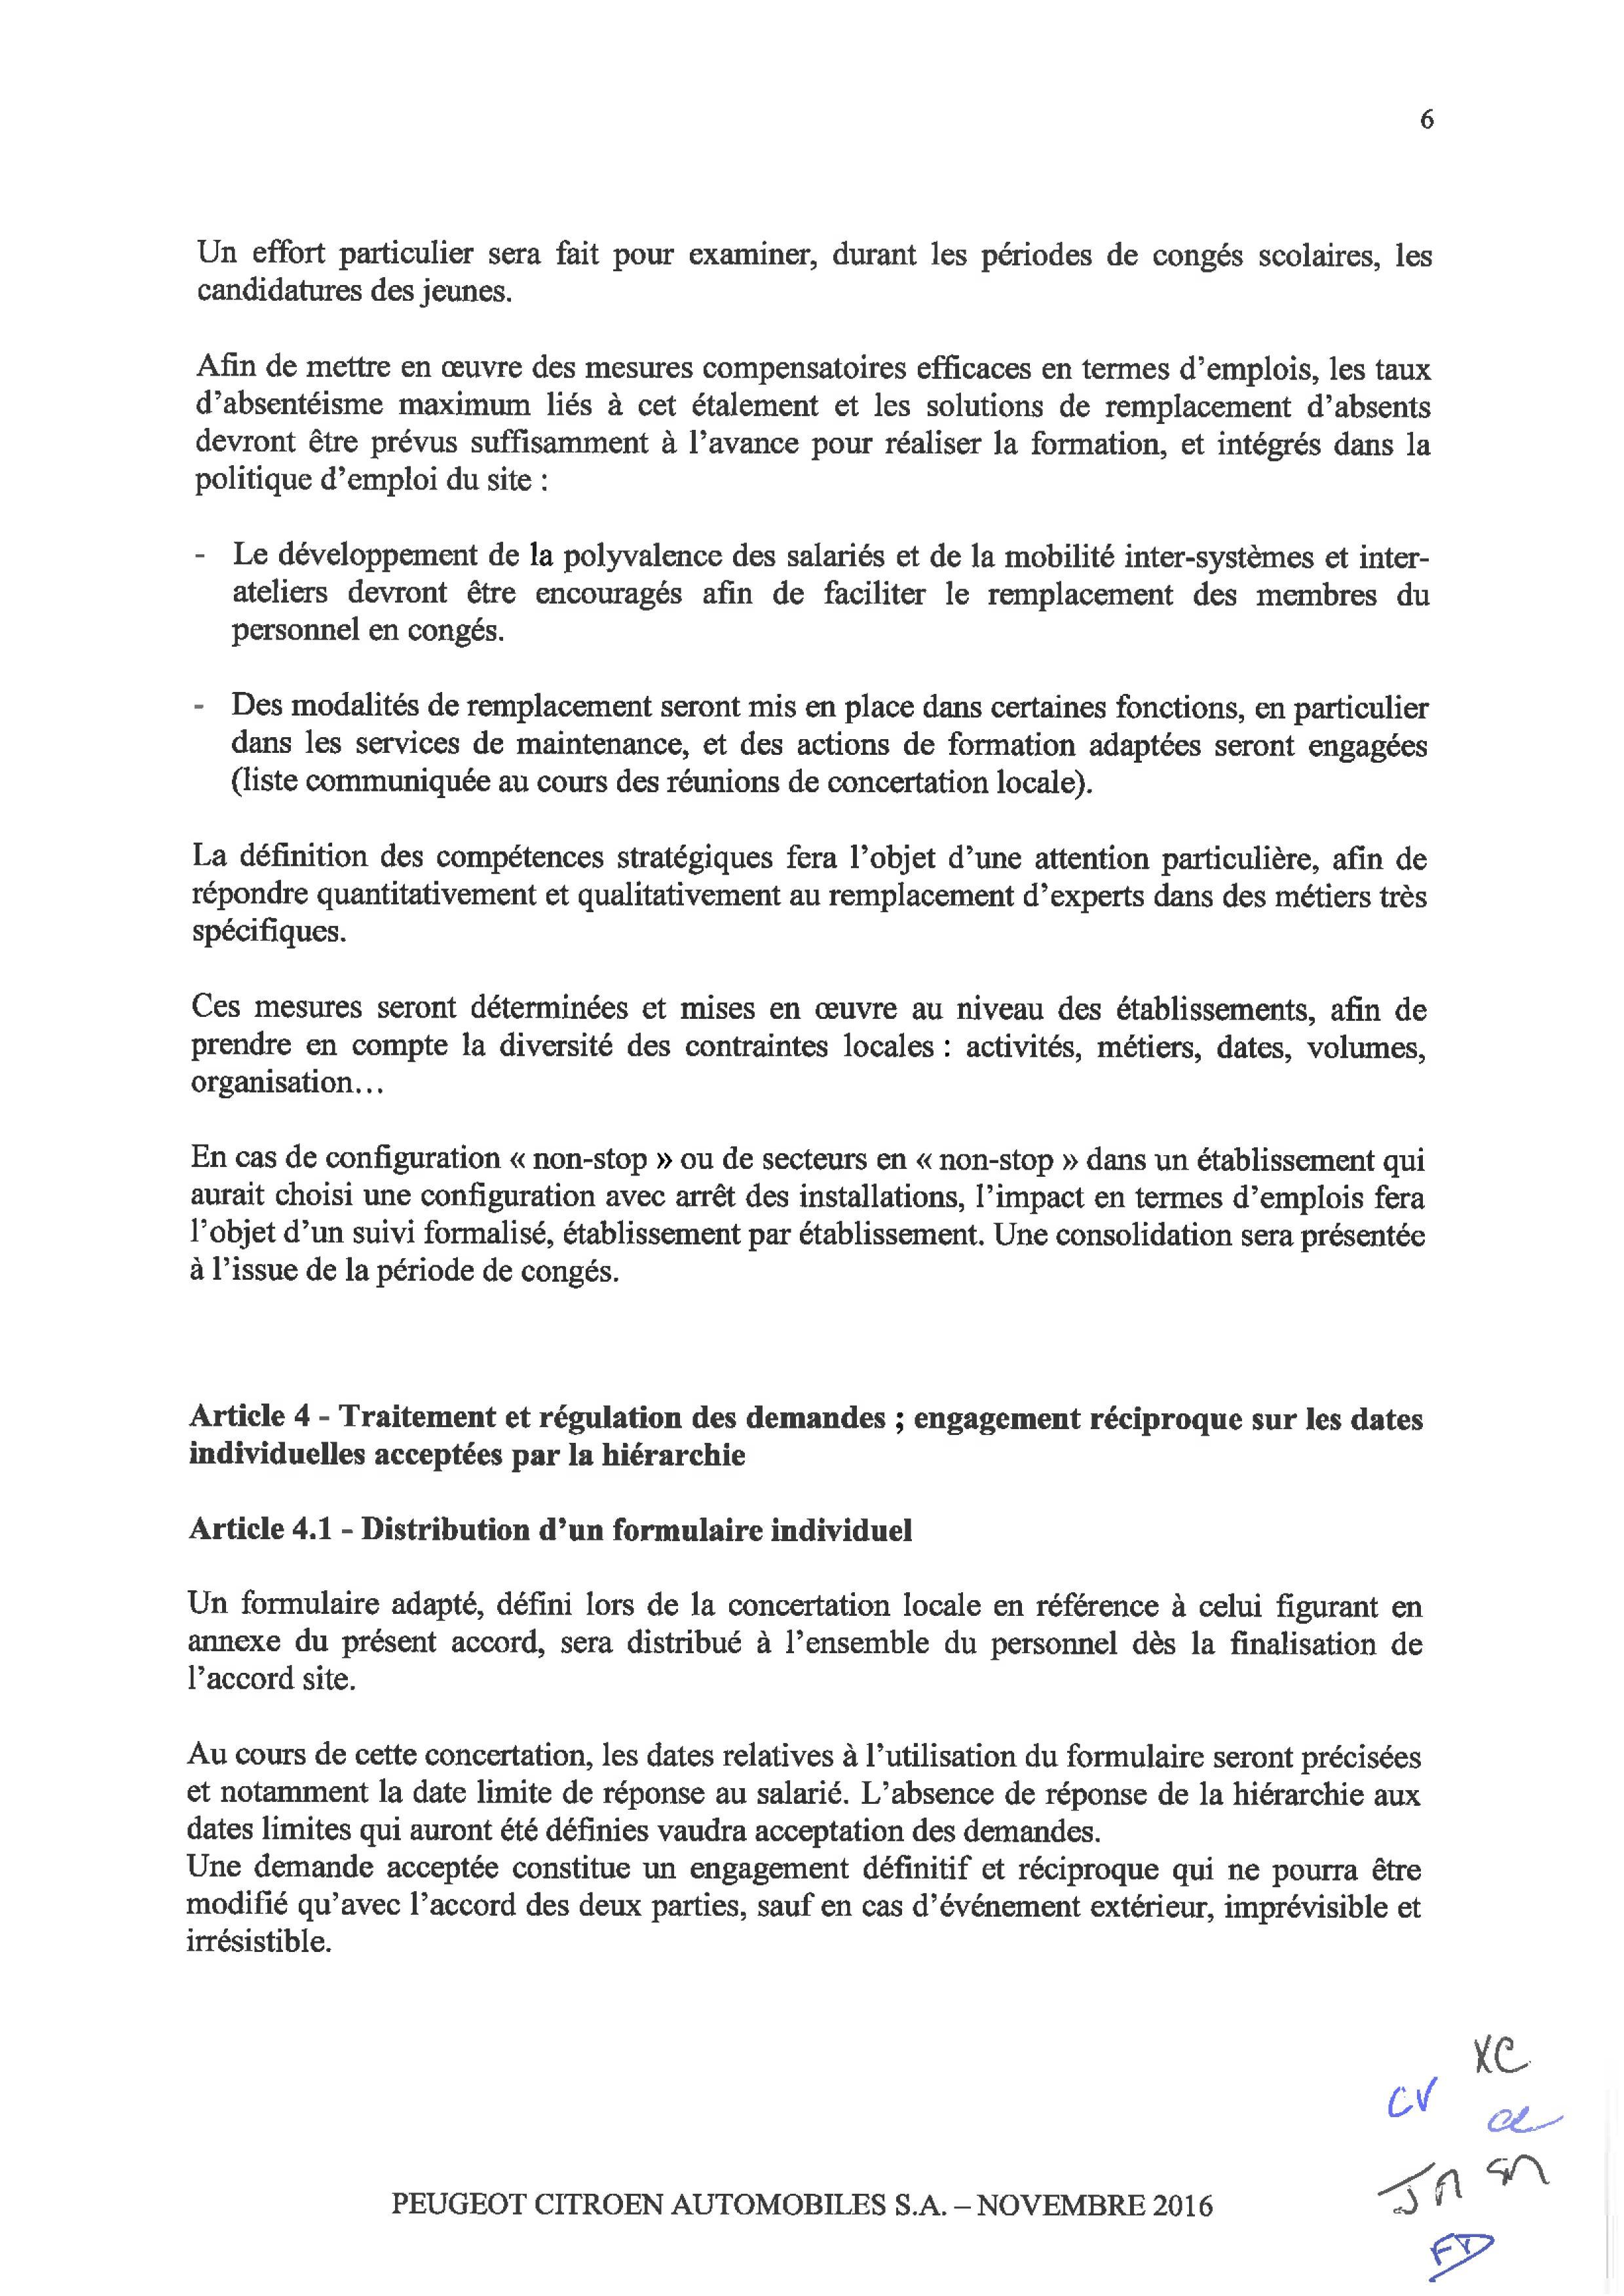 Accord centrale TT Congés_05